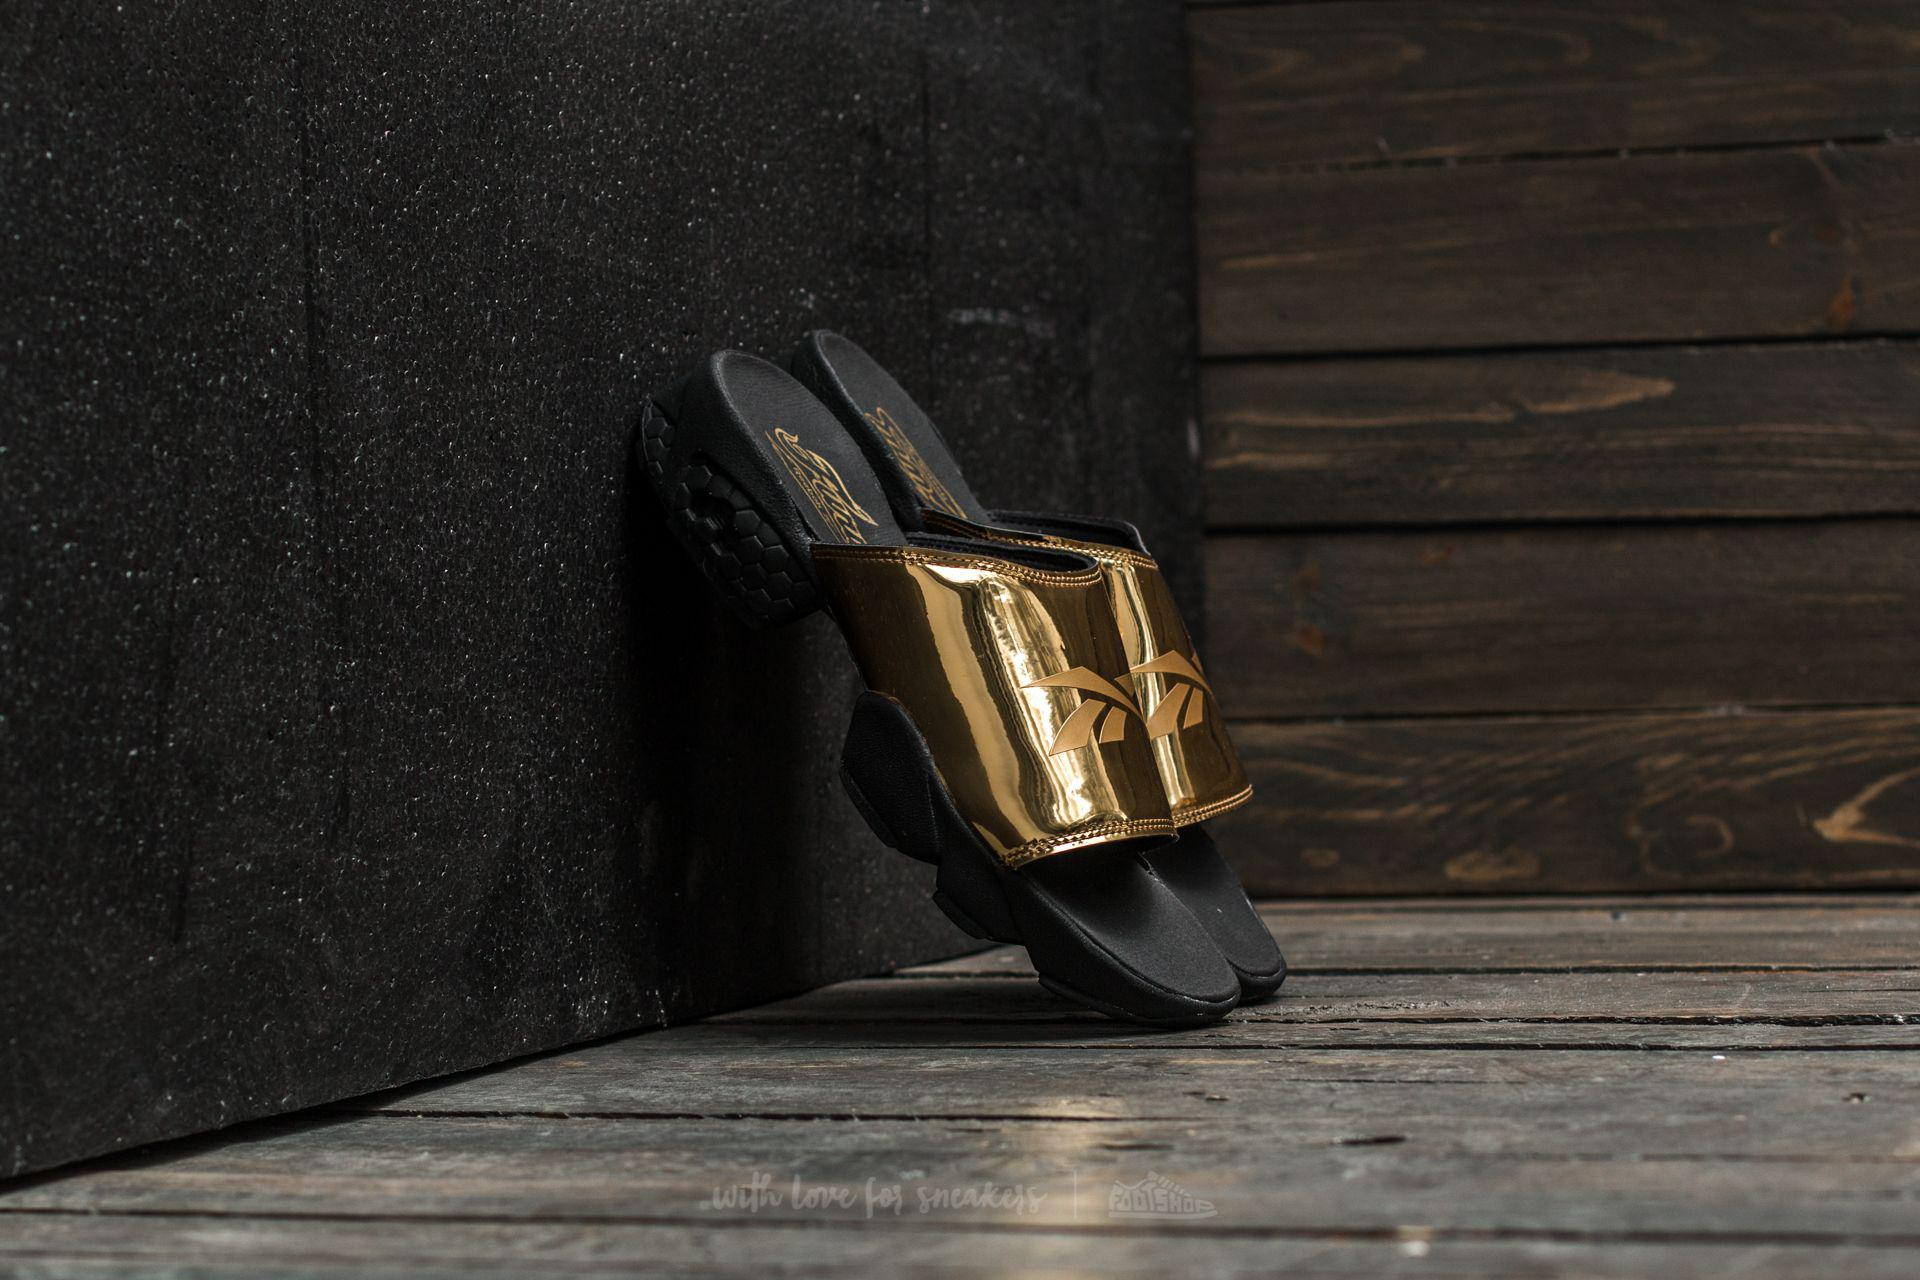 bff517af0349d Lyst - Reebok Reebok Fury Slide Magic Hour Gold Metal  Black  White ...